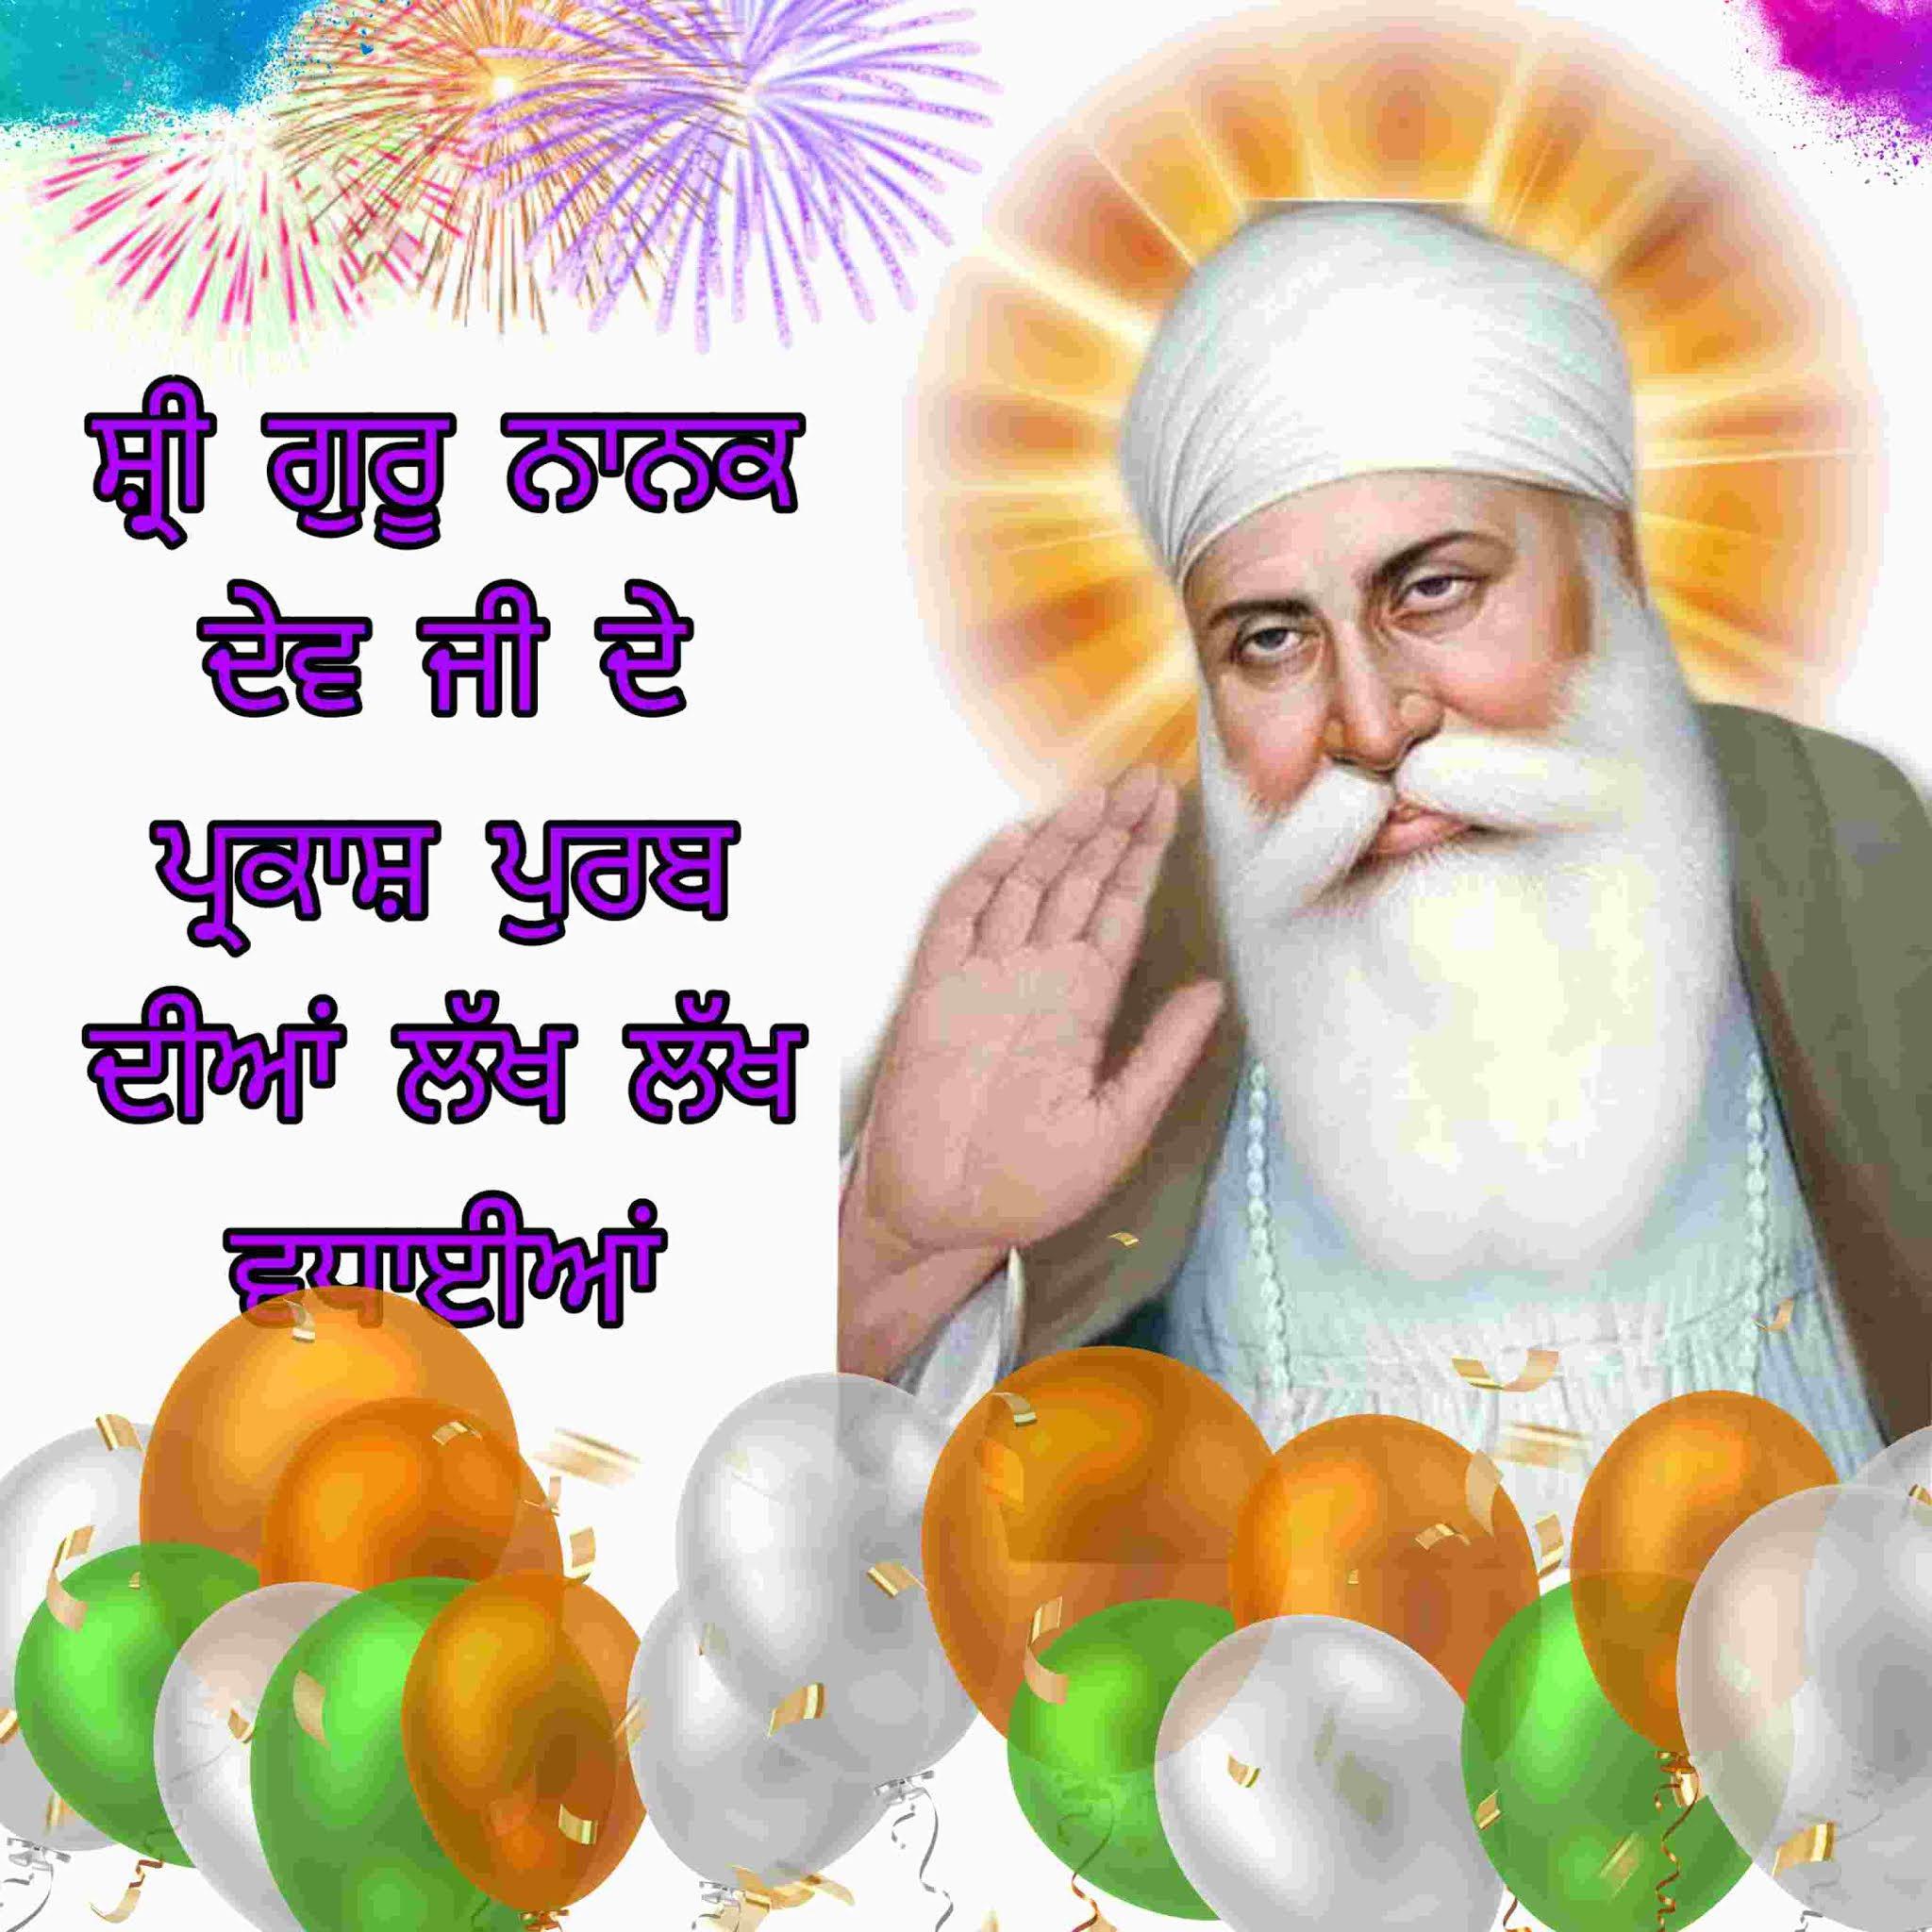 gurupurab wishes in punjabi, gurunanak dev ji imahes,